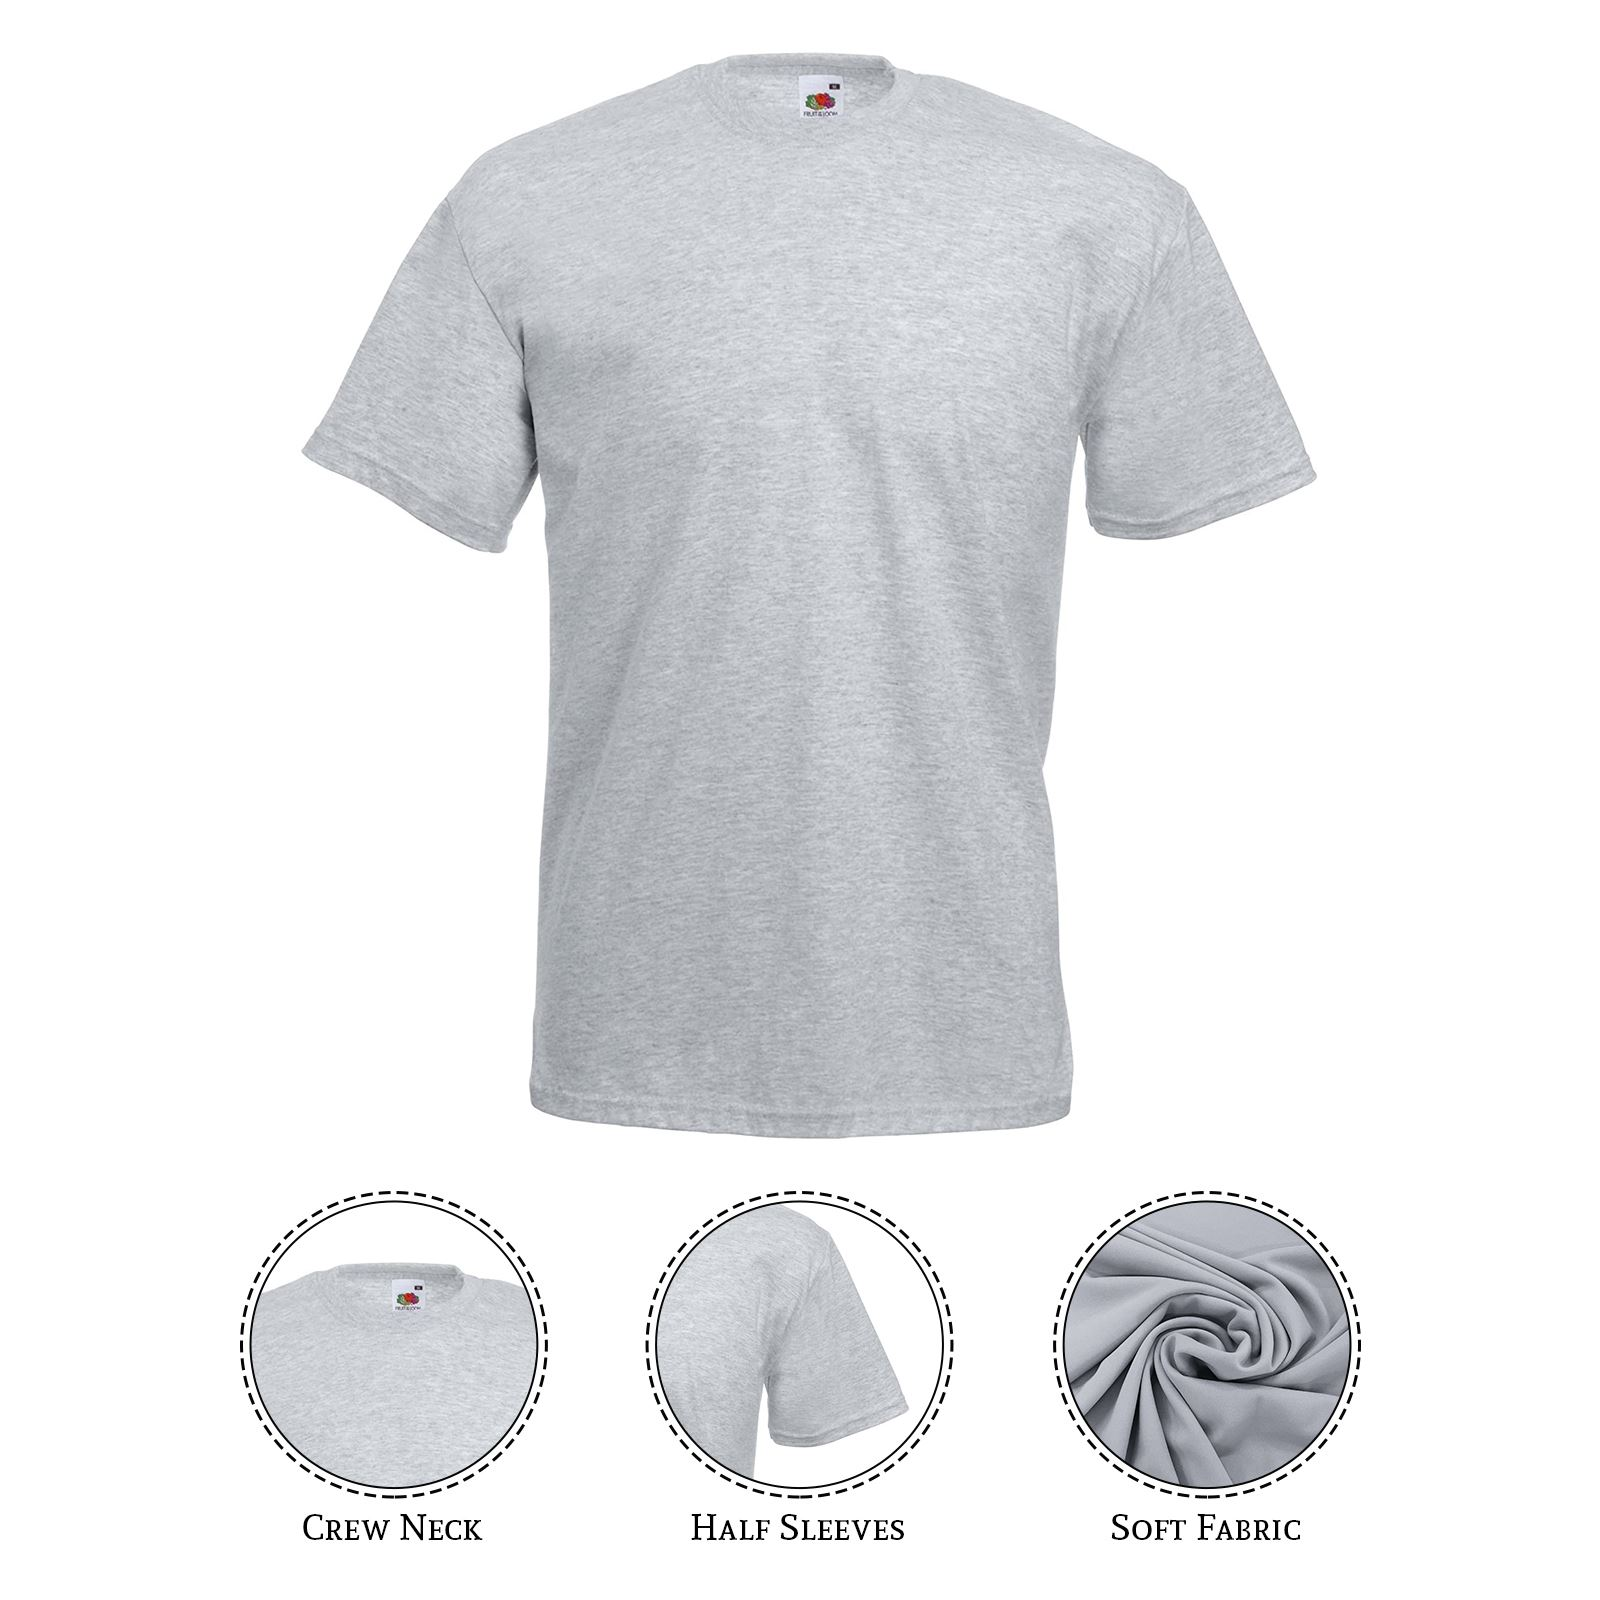 thumbnail 13 - Men-s-Fruit-Of-The-Loom-T-Shirt-Original-100-Cotton-Casual-Plain-Top-Tee